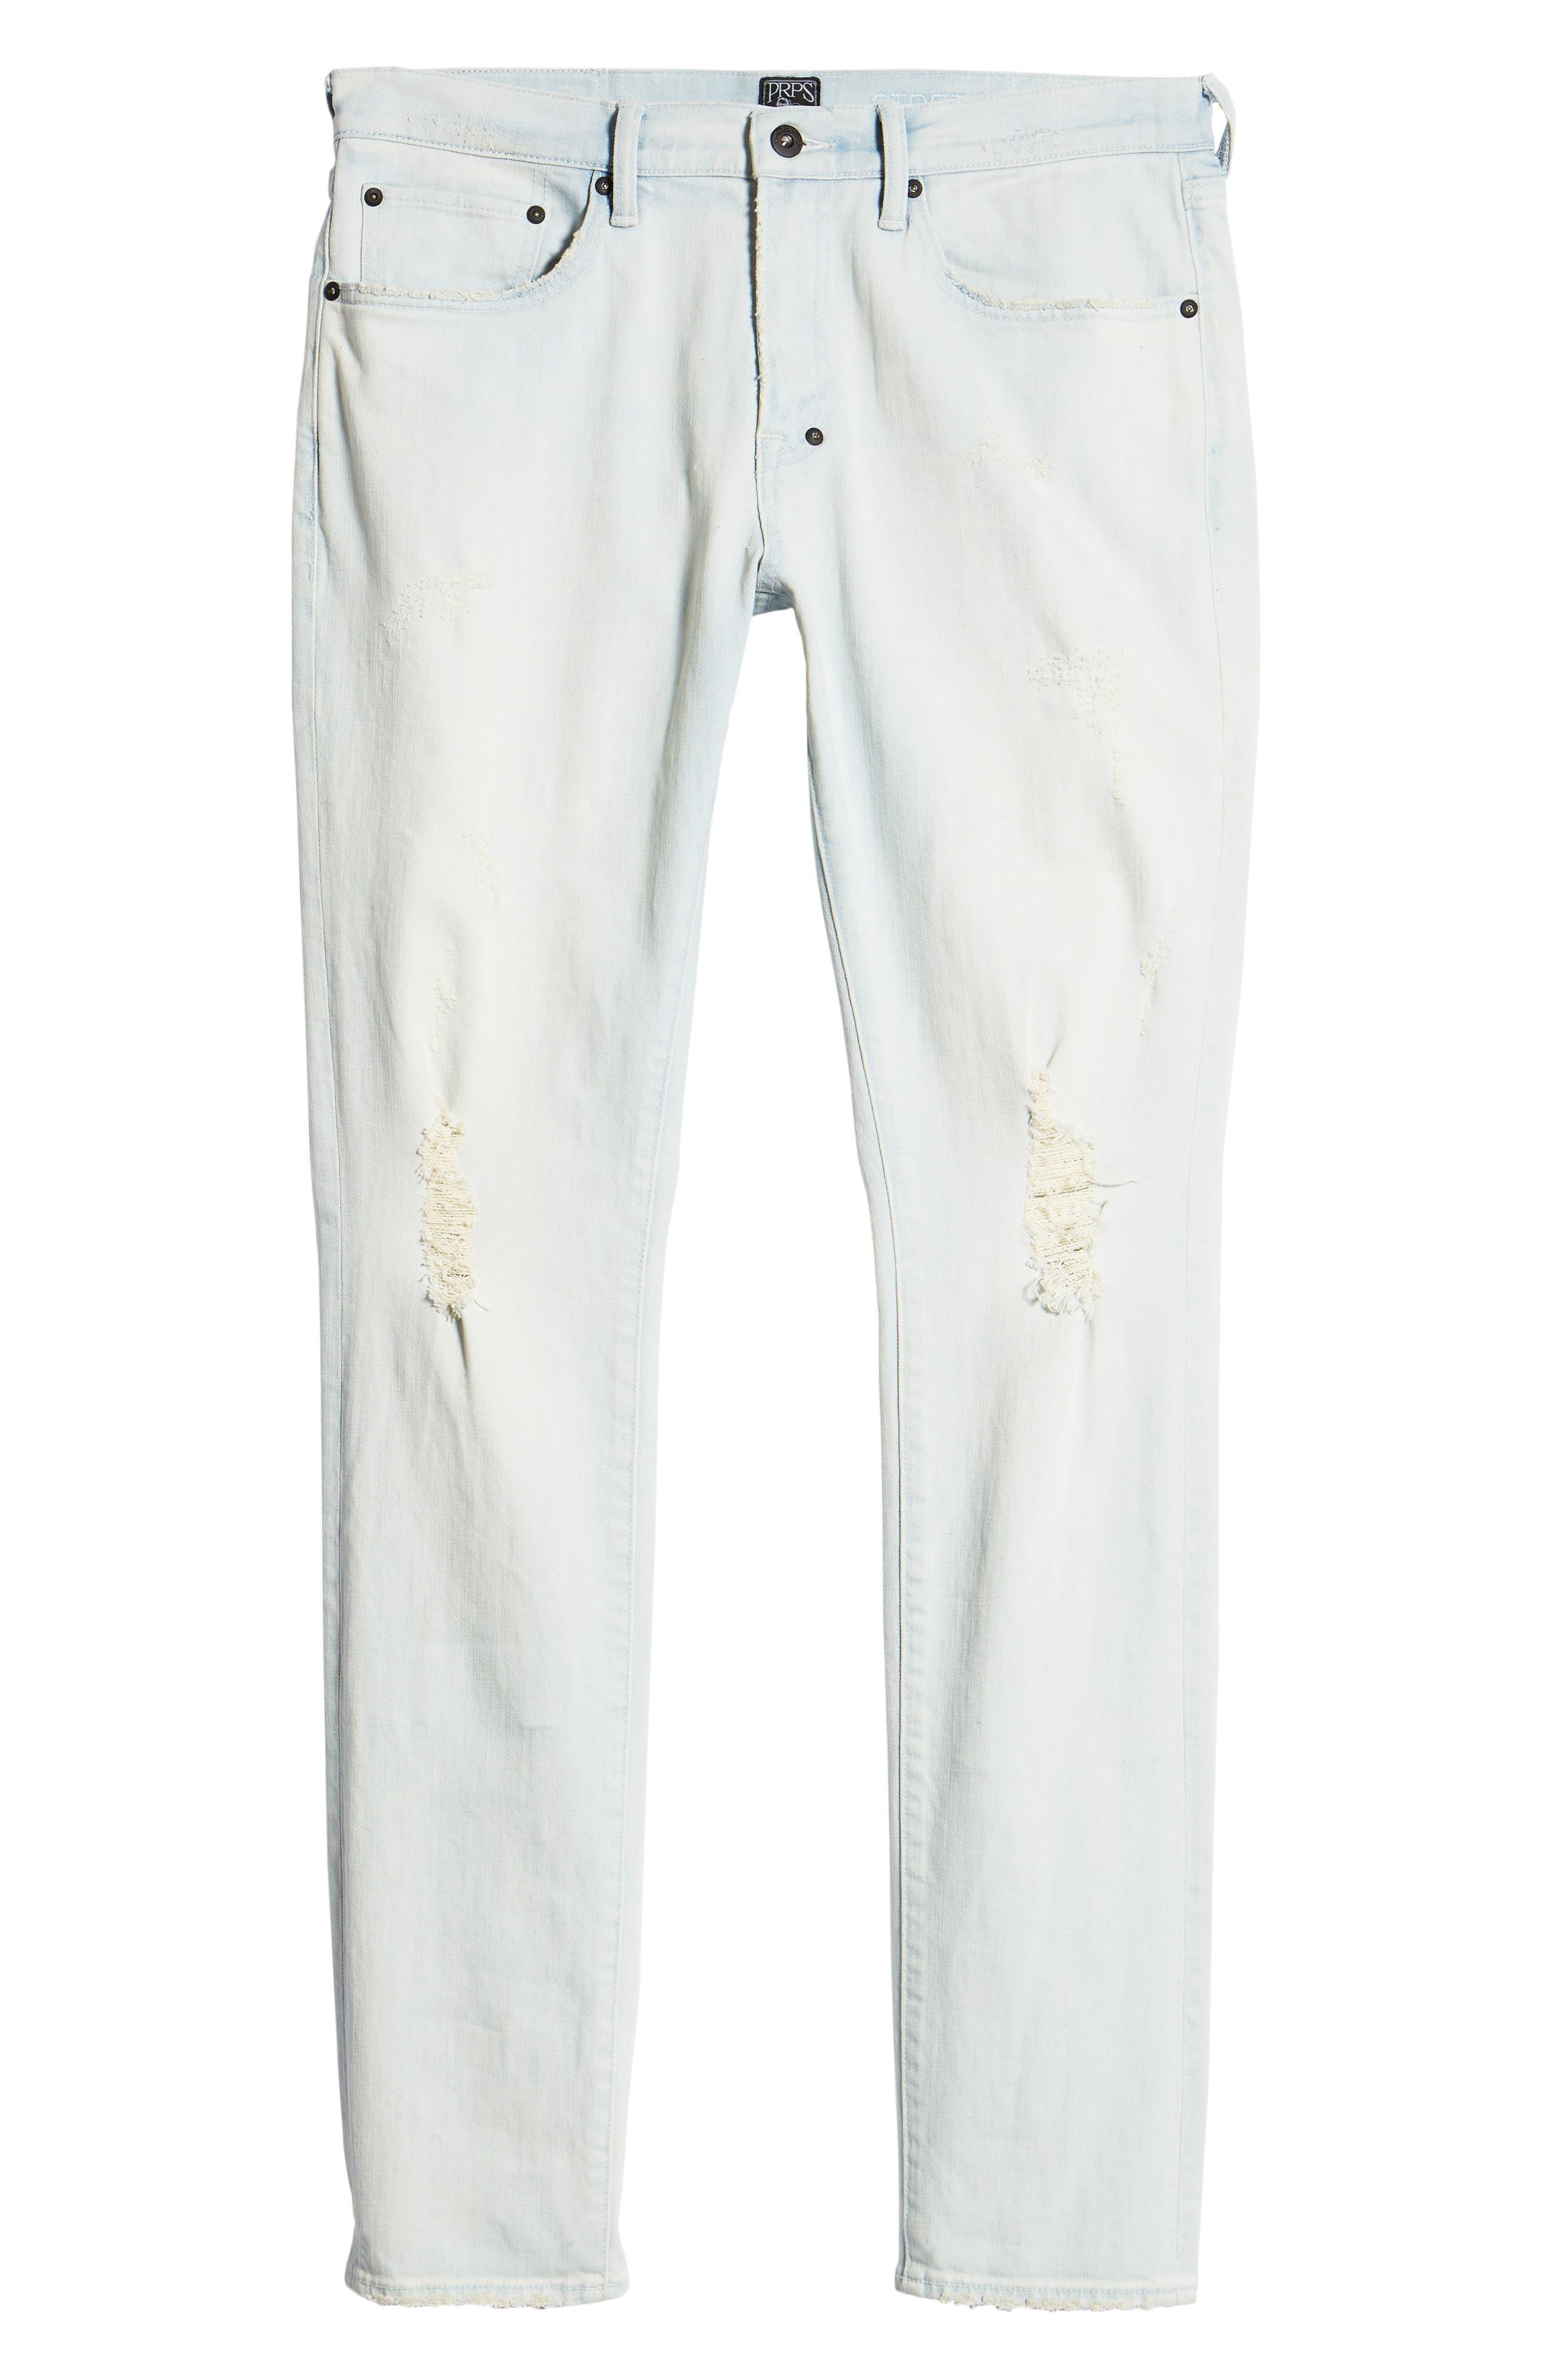 Windsor Slim Fit Jeans,                             Alternate thumbnail 6, color,                             Blue